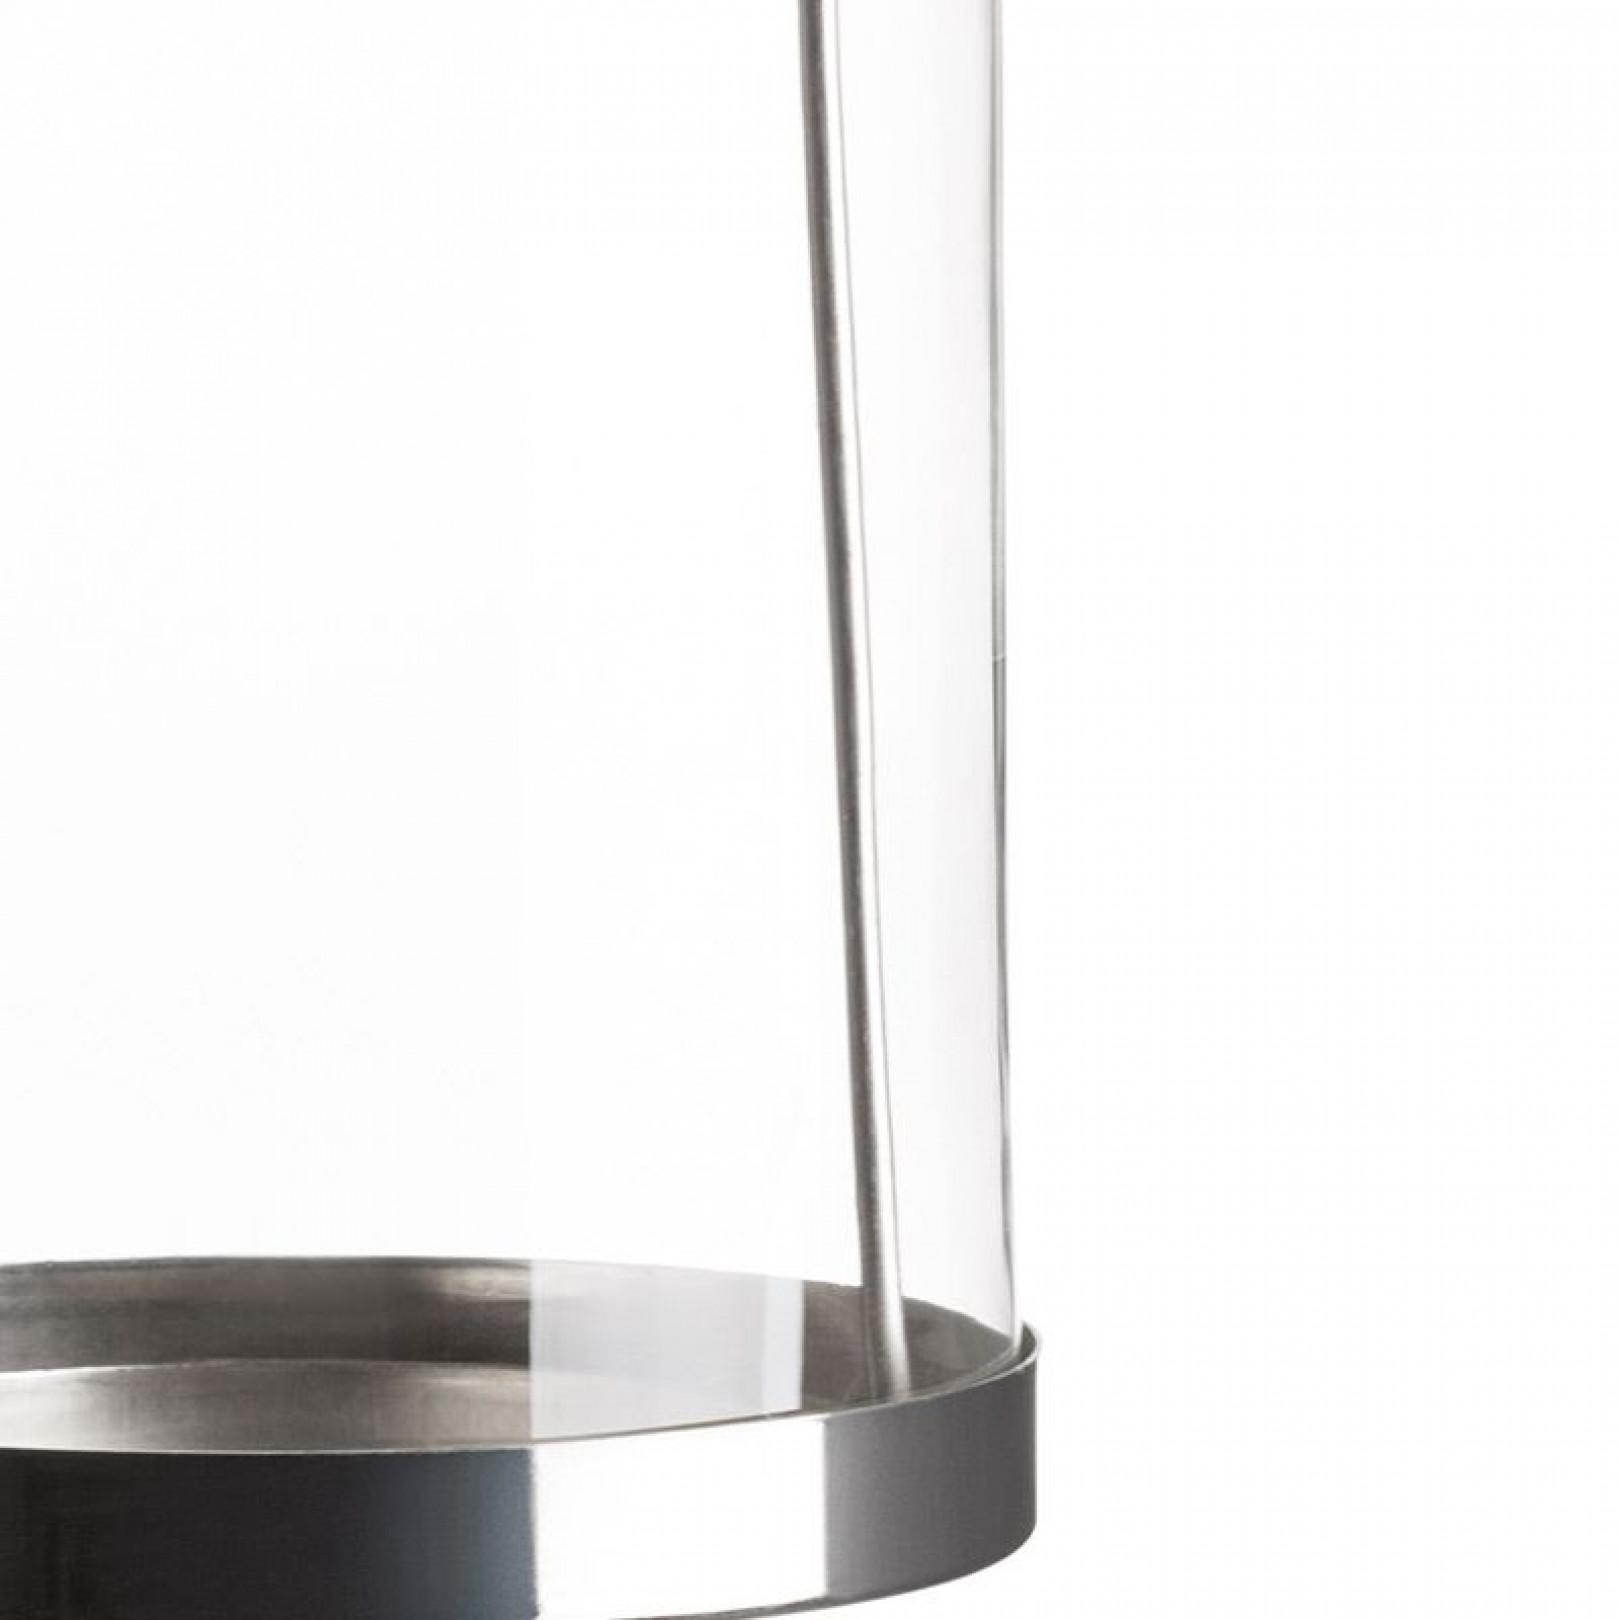 Glas-Hängekerzenhalter   Laterne Ø 11 cm x 24,8 cm